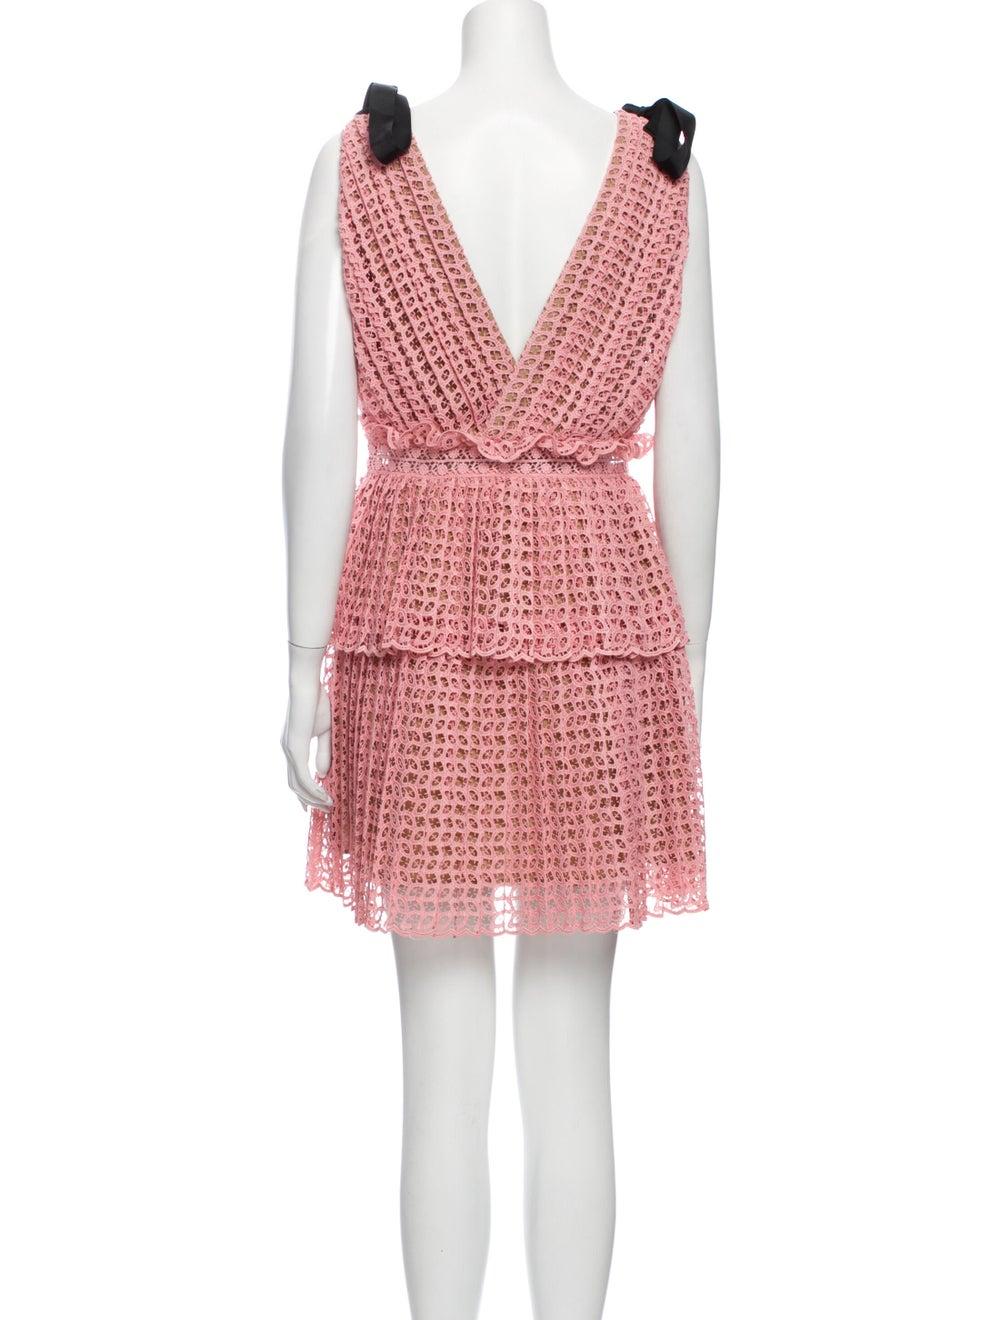 Self-Portrait Printed Mini Dress Pink - image 3